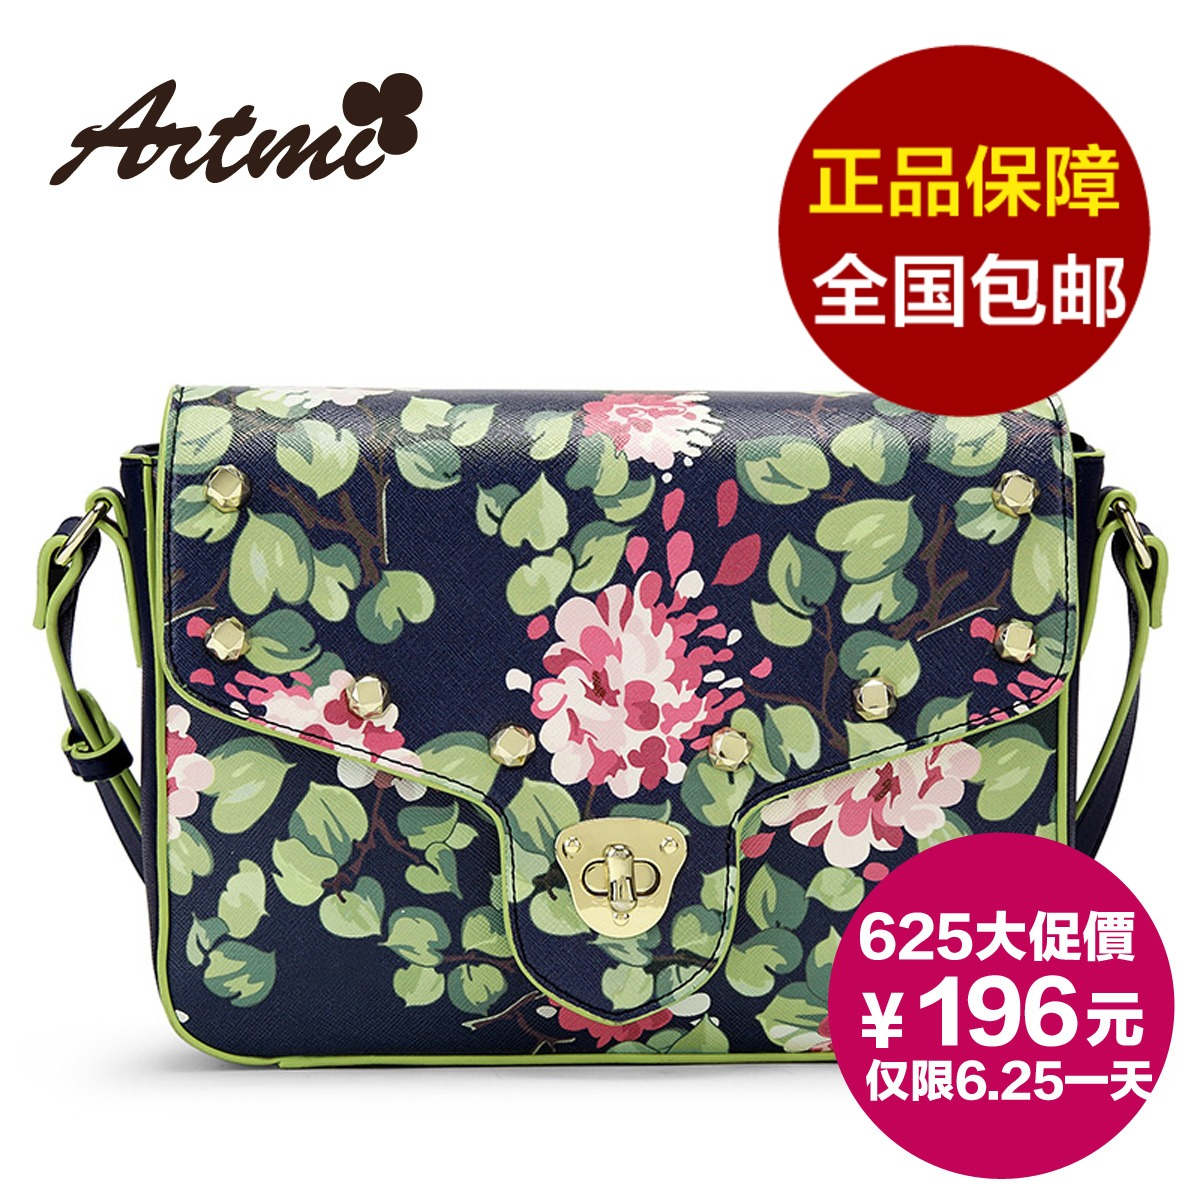 Сумка Artmi ape0651 сумка artmi ane0401 artmi2014